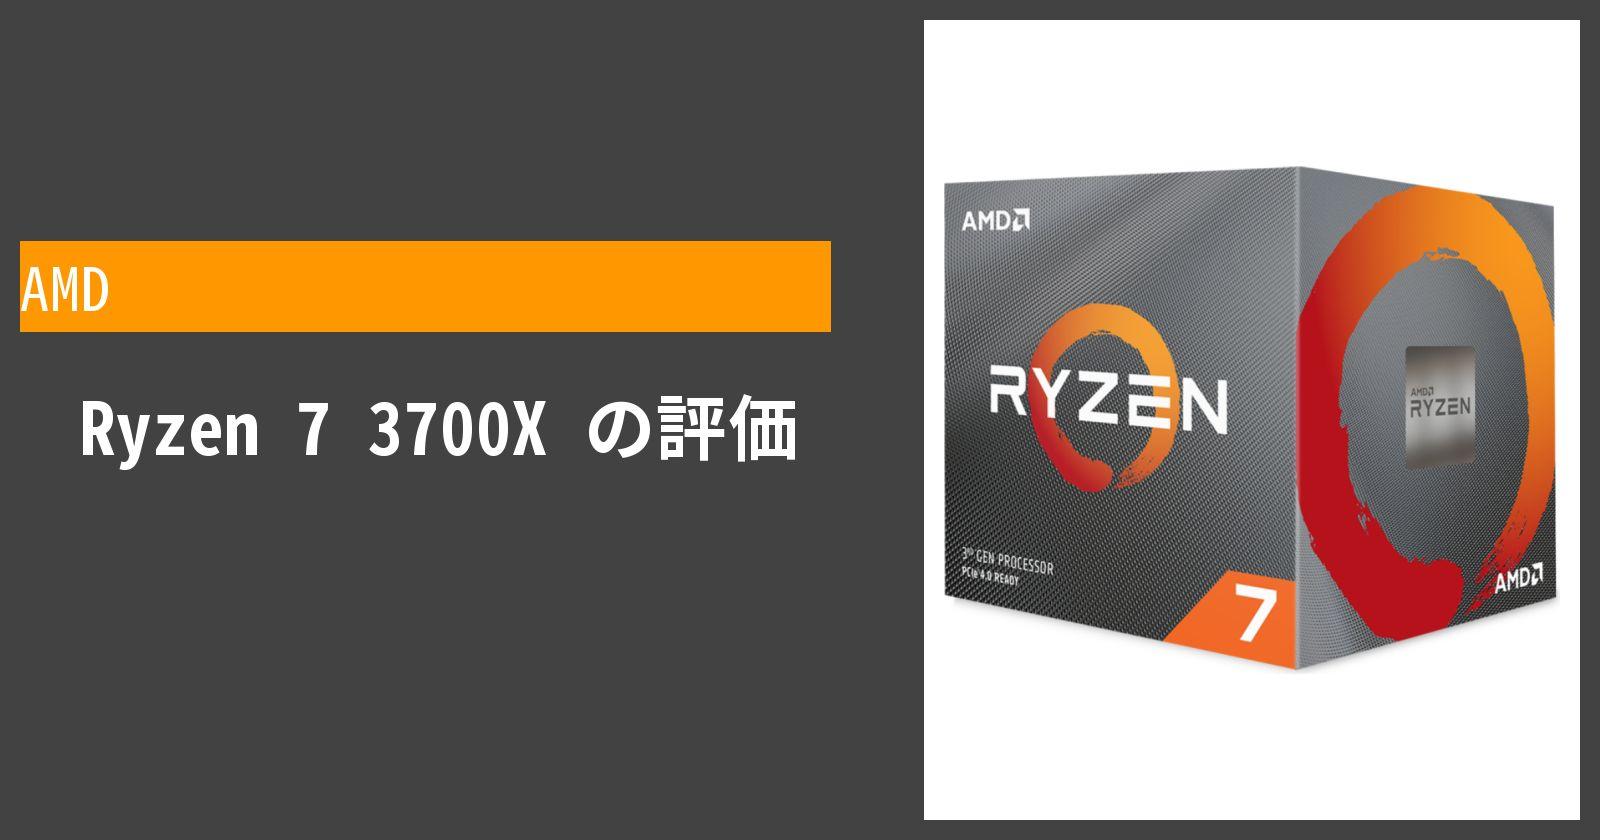 Ryzen 7 3700Xを徹底評価